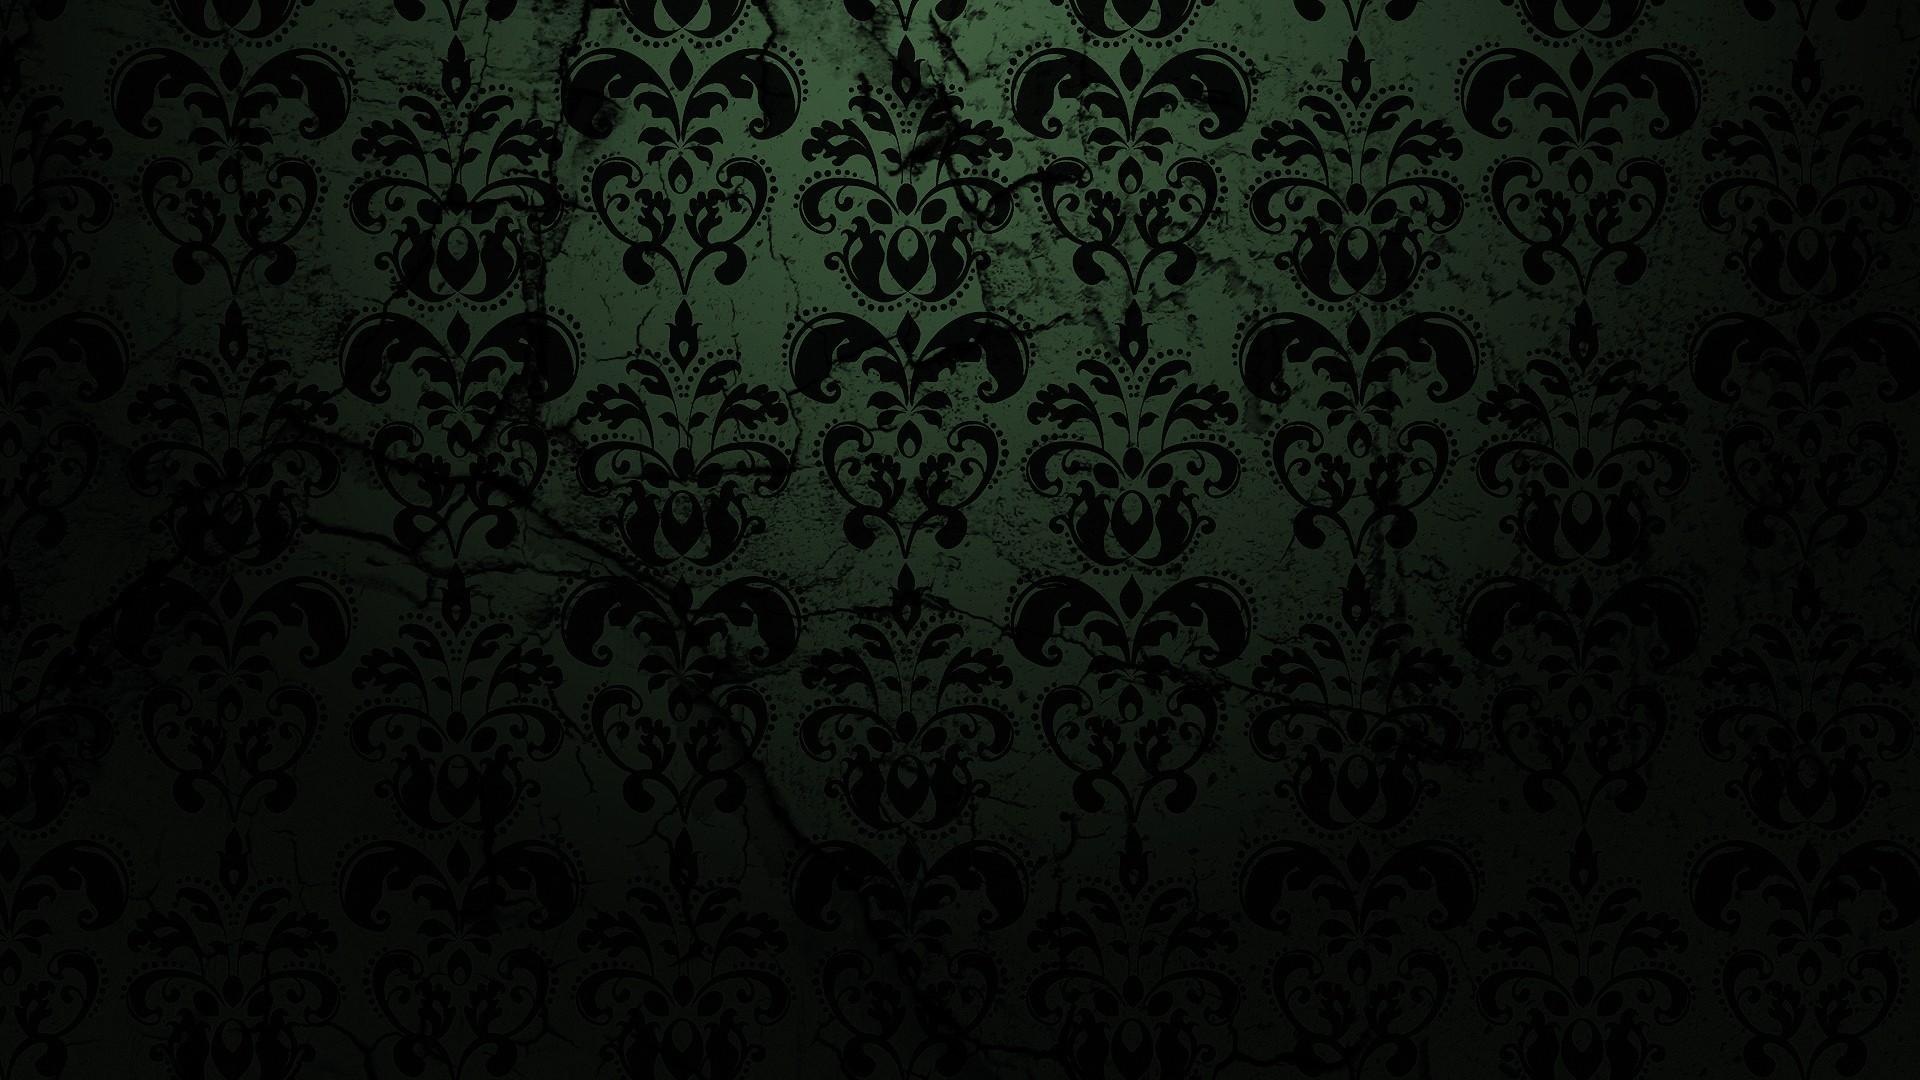 Wallpapers Crazy 1920x1080